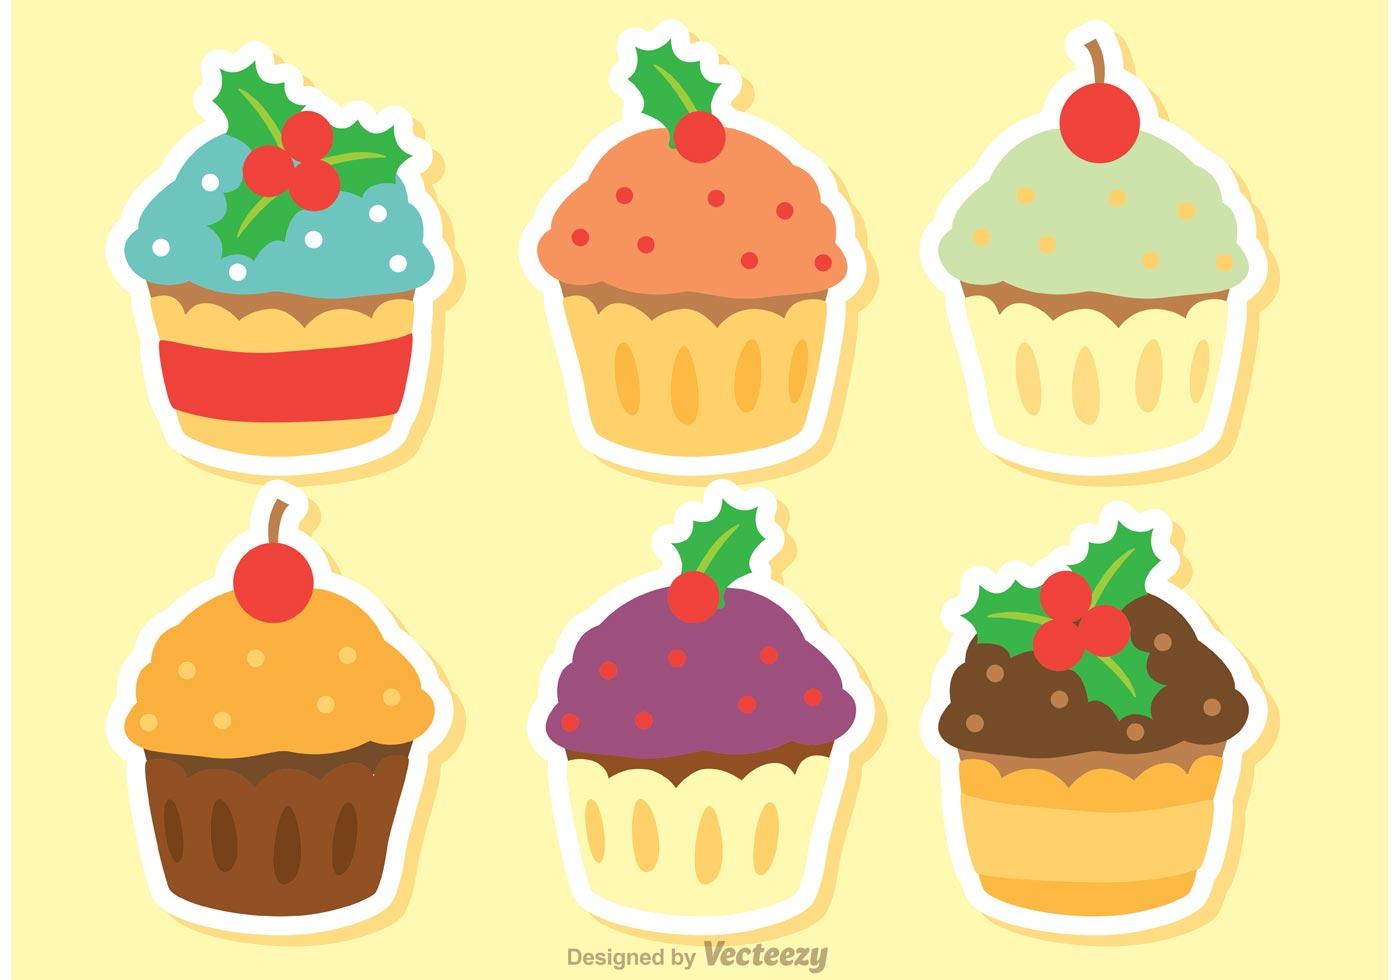 cupcake free vector art 4129 free downloads rh vecteezy com cake vectors cupcake factory blog